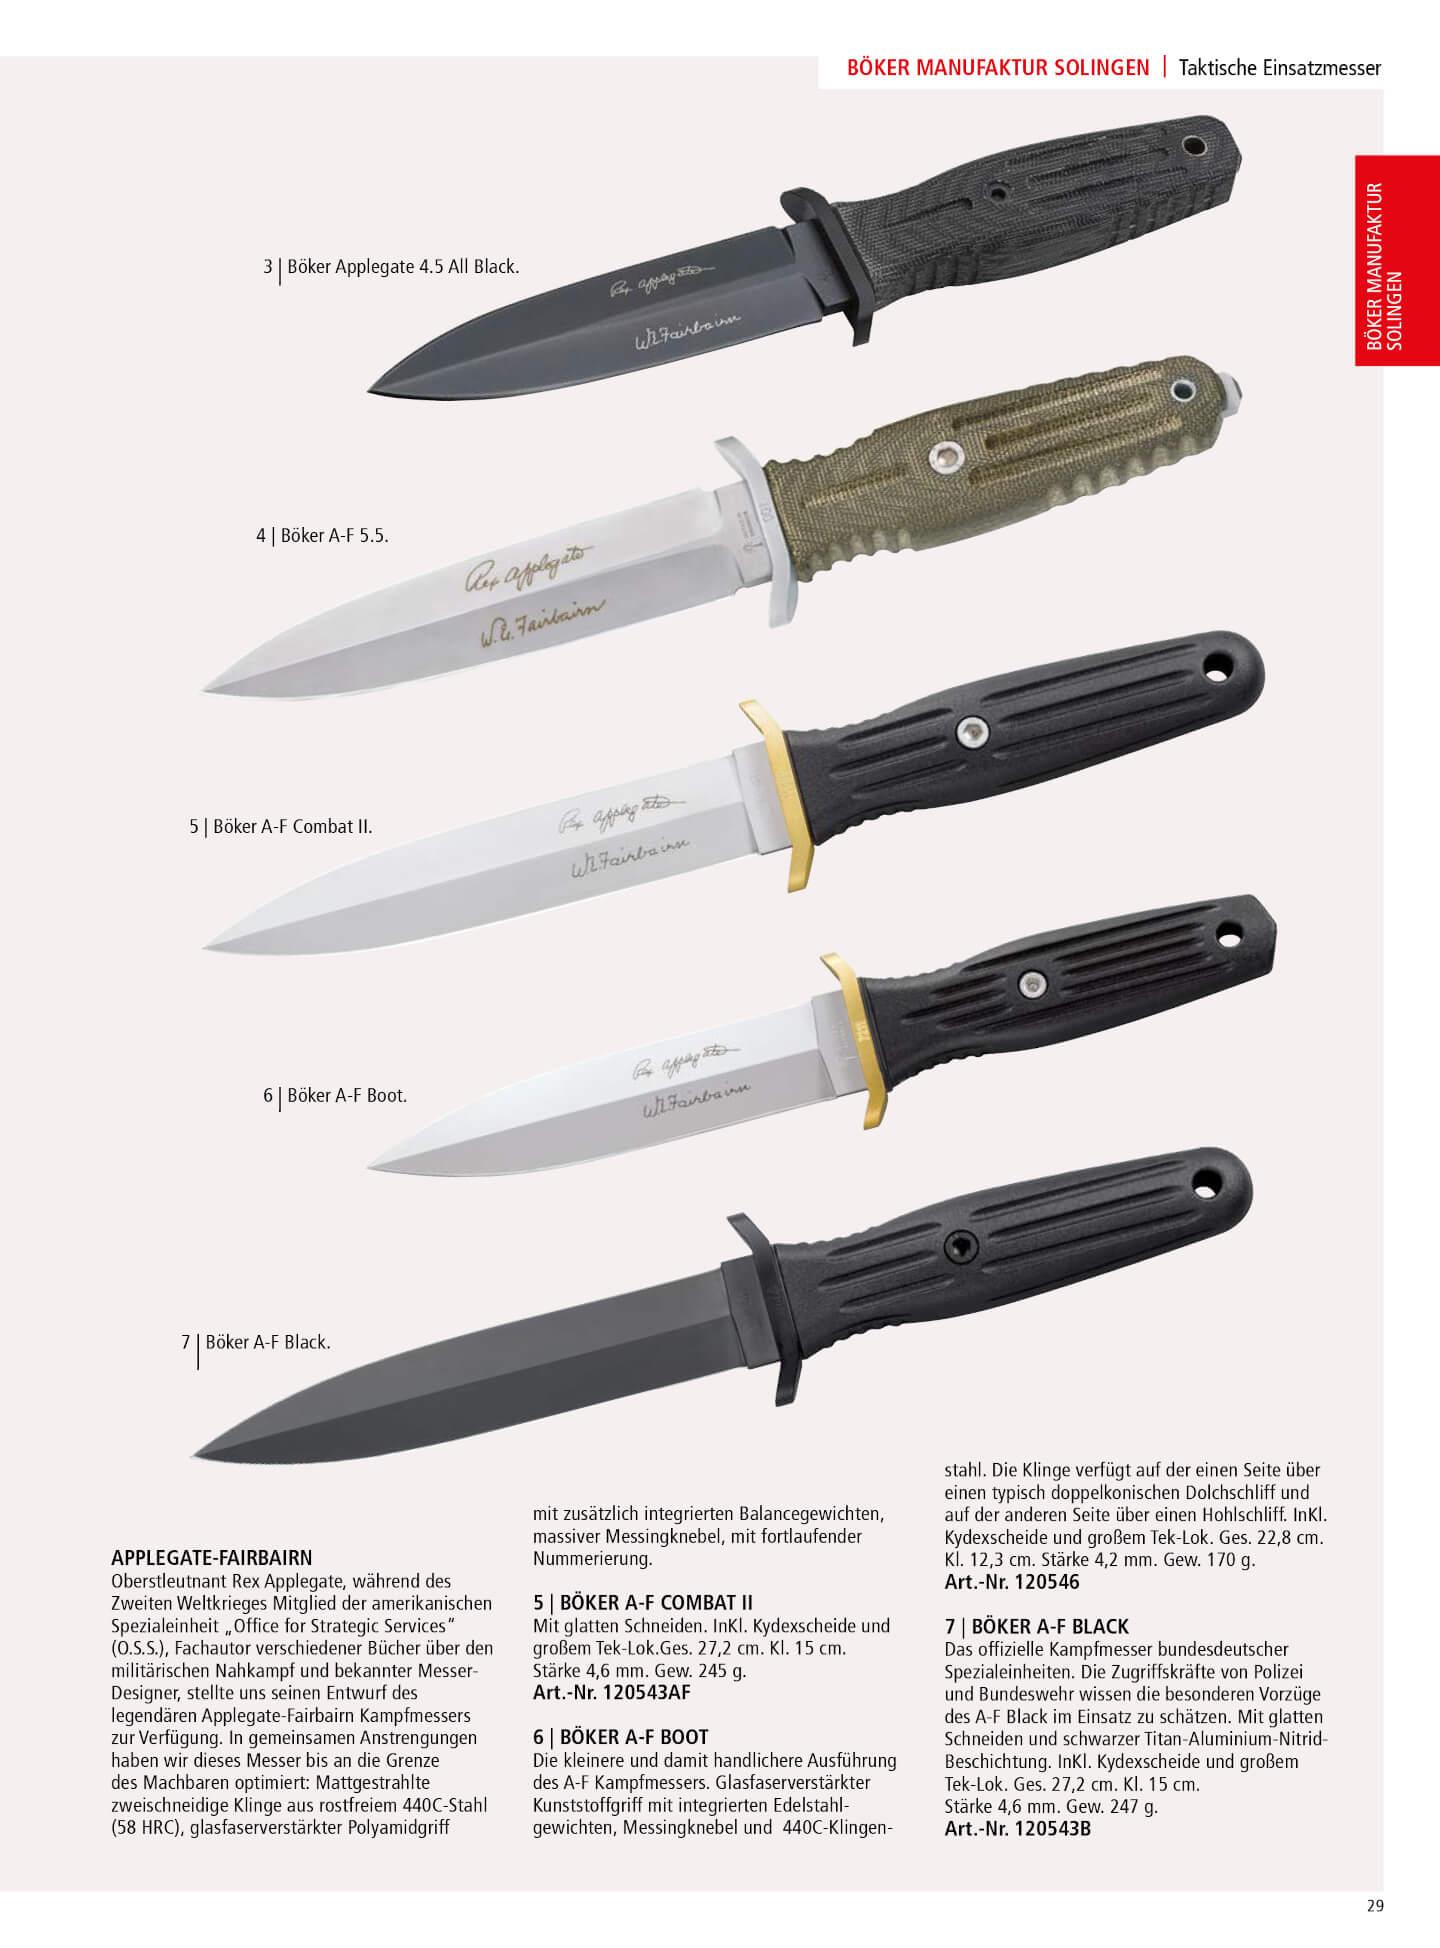 120644 Tactical Knives 2 Boker Tactical Knives Tactical Cutlery